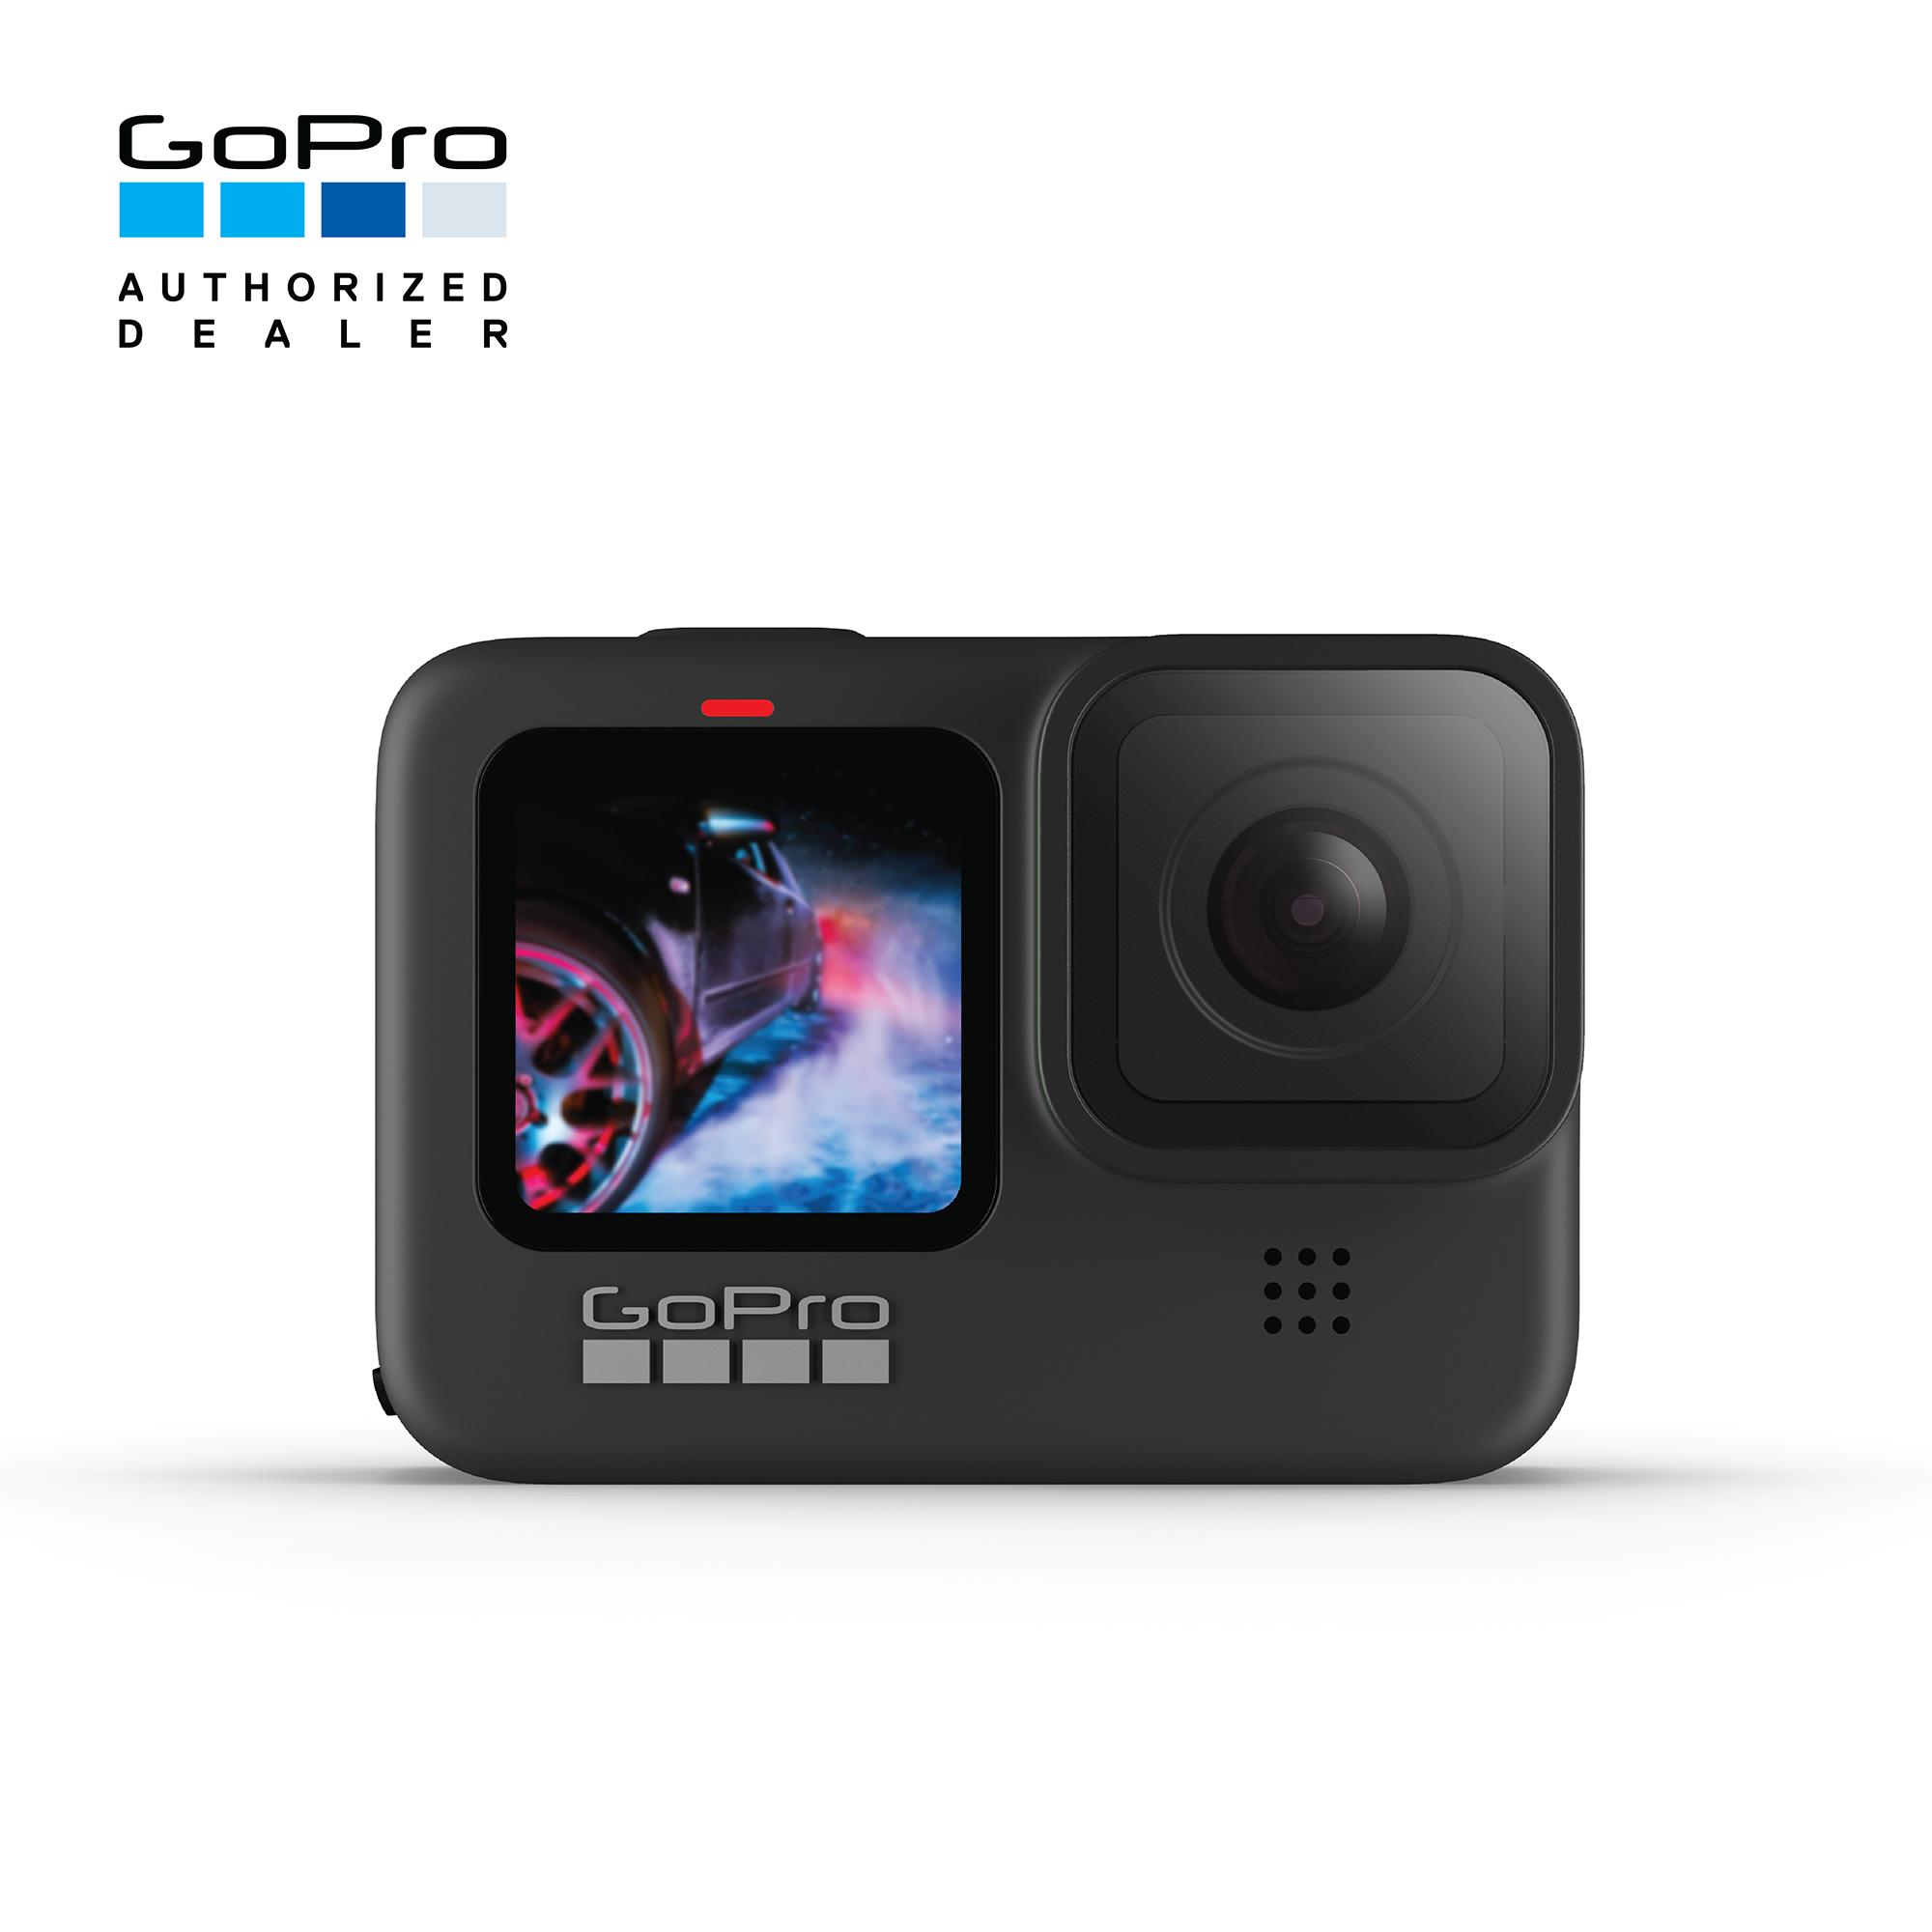 Gopro Hero9 Black กล้อง Action Camera กันน้ำได้สูงสุด 10 เมตร ถ่ายวีดีโอ 5k, Full Hd 240fps ภาพนิ่ง 20mp โหมดกันสั่น Hypersmooth 3.0 ในตัว.